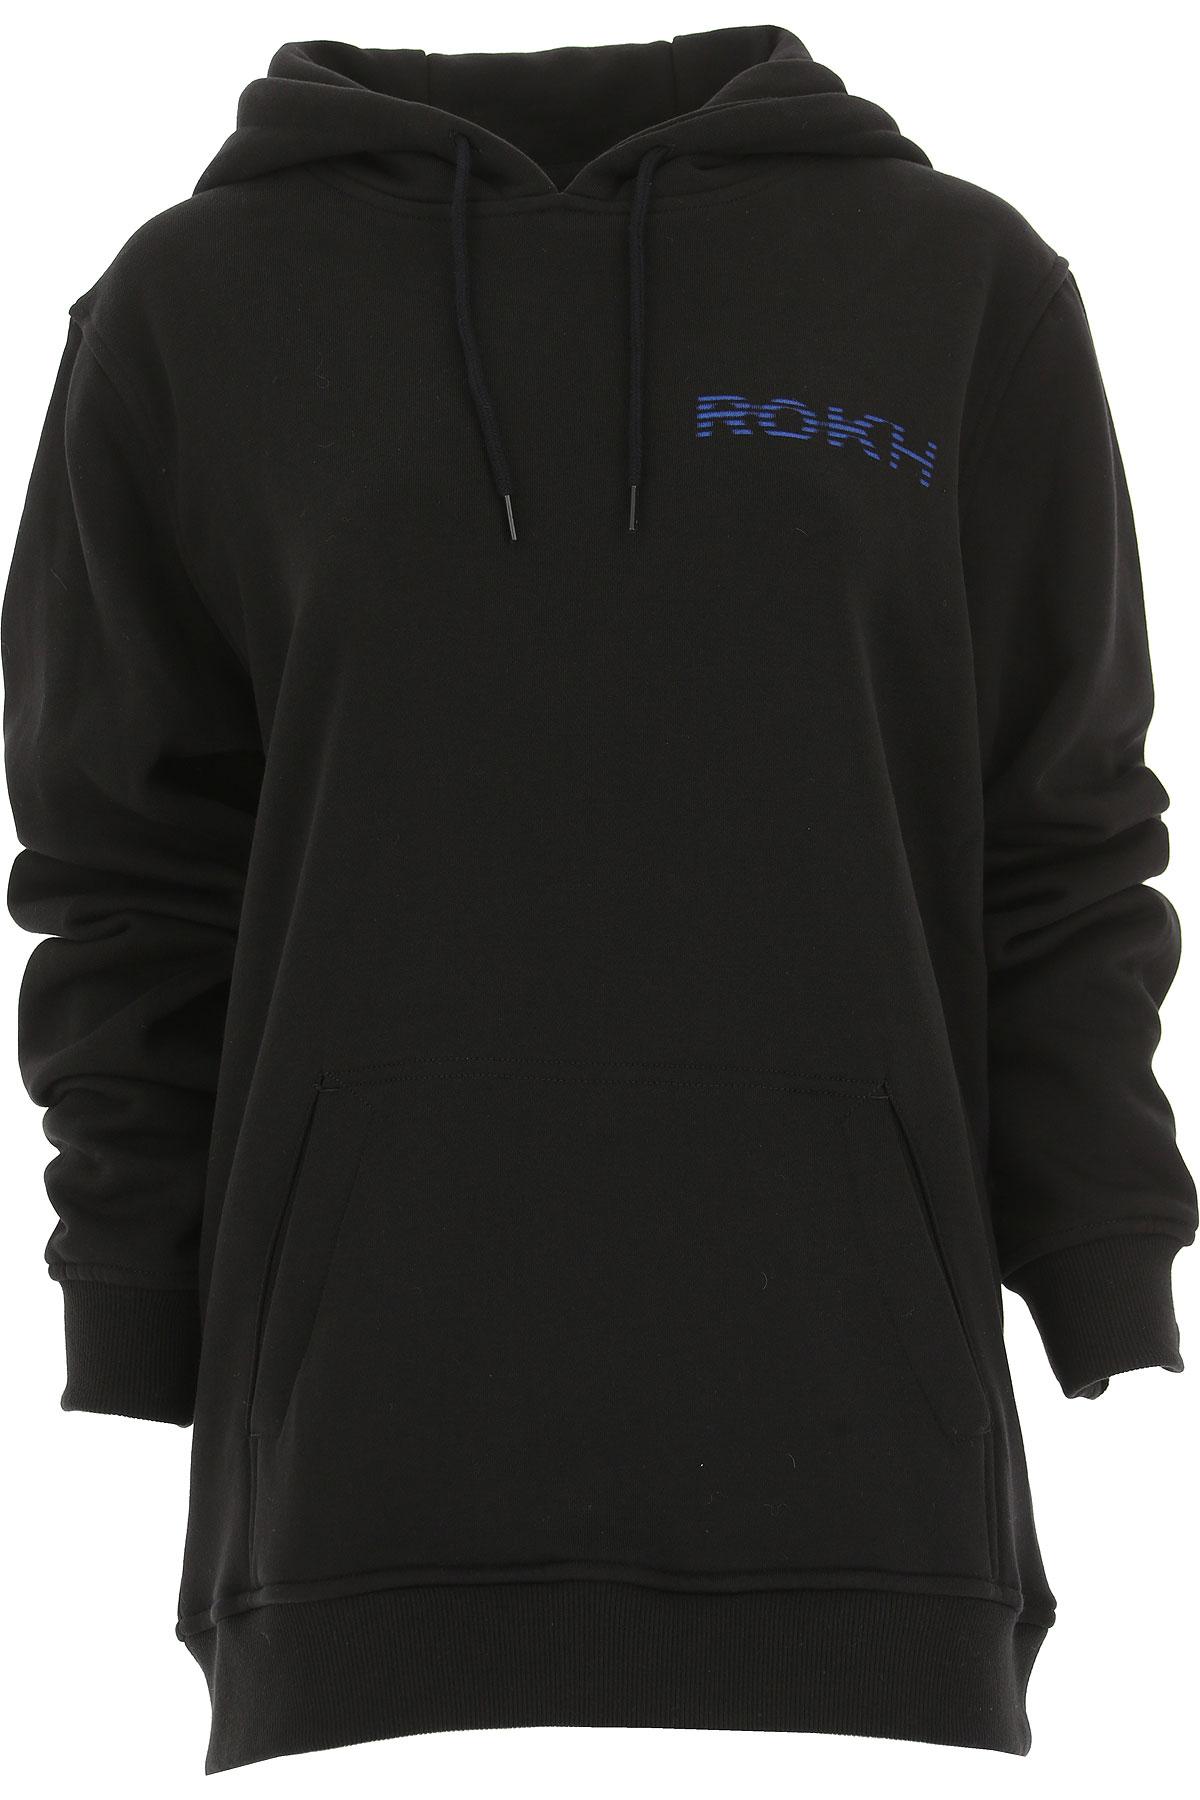 Image of Rokh Sweatshirt for Women, Black, Cotton, 2017, 2 4 6